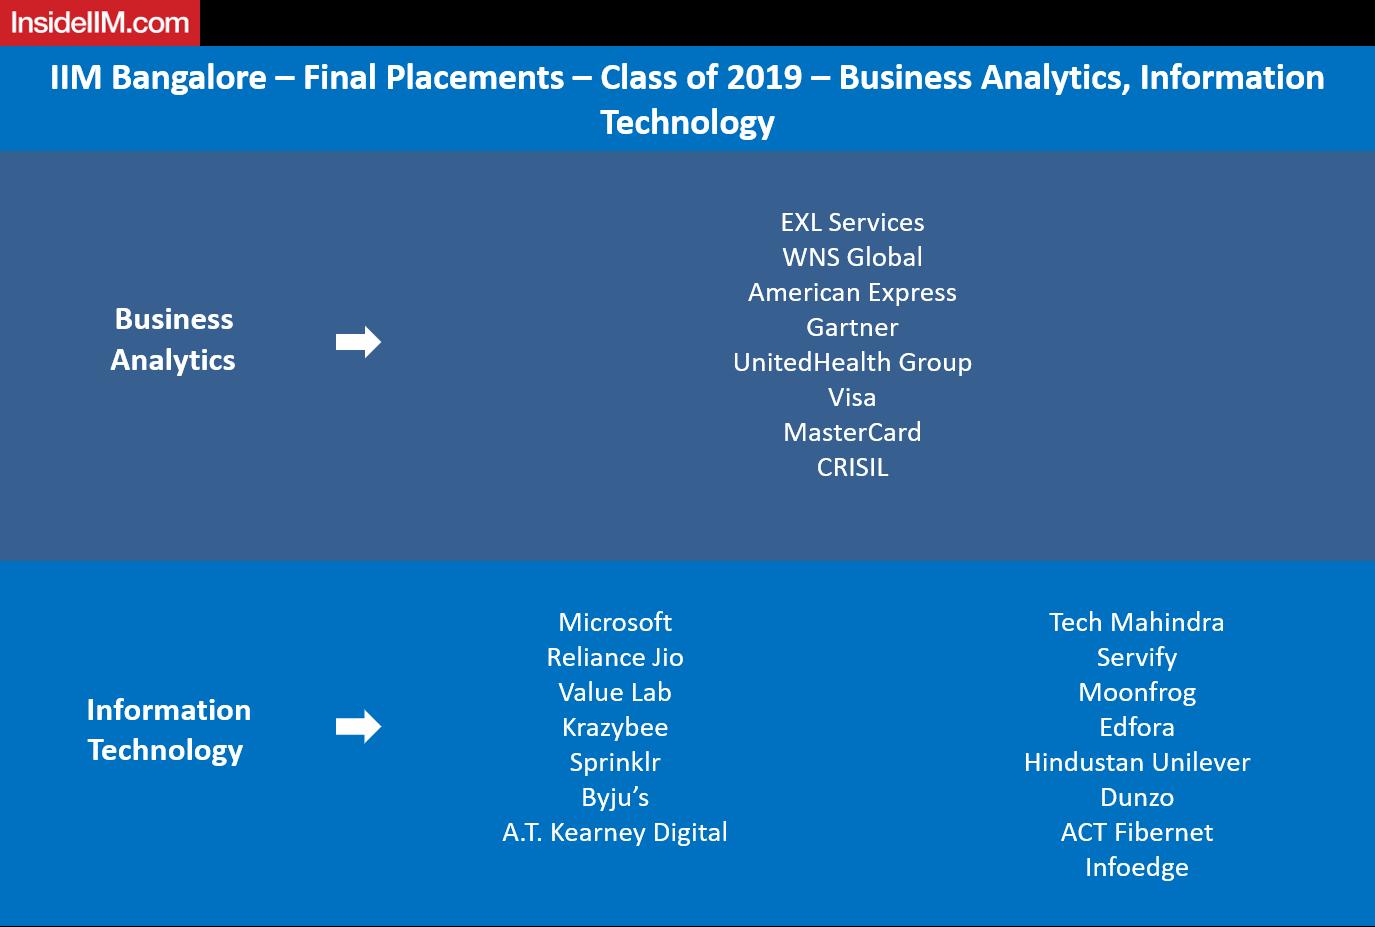 IIM Bangalore Final Placements 2019 - Analytics and IT